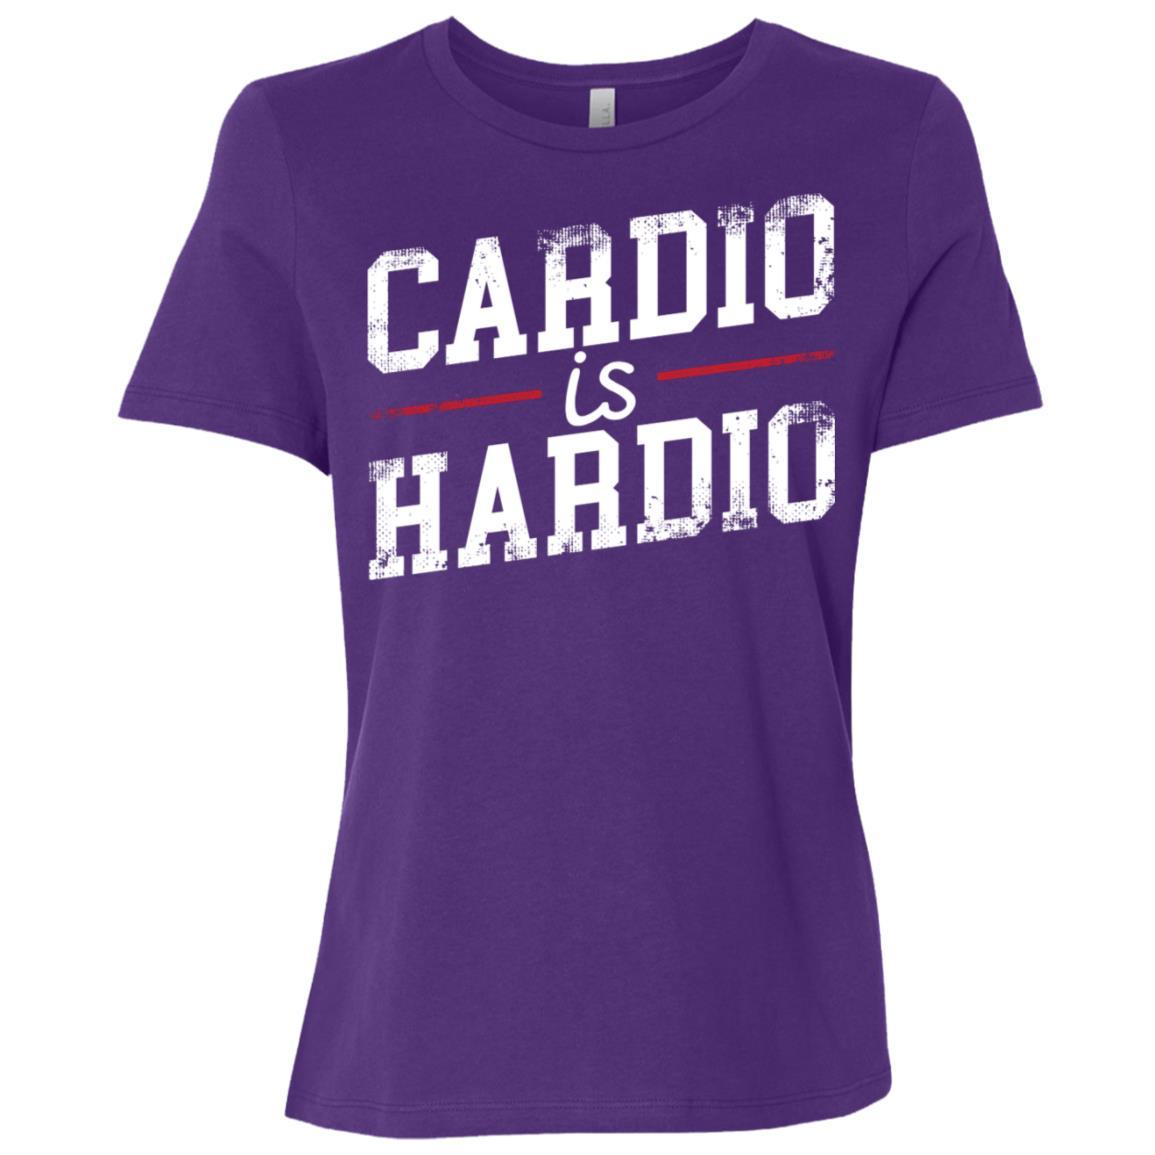 Cardio Is Hardio Fitness Workout Gift Women Short Sleeve T-Shirt